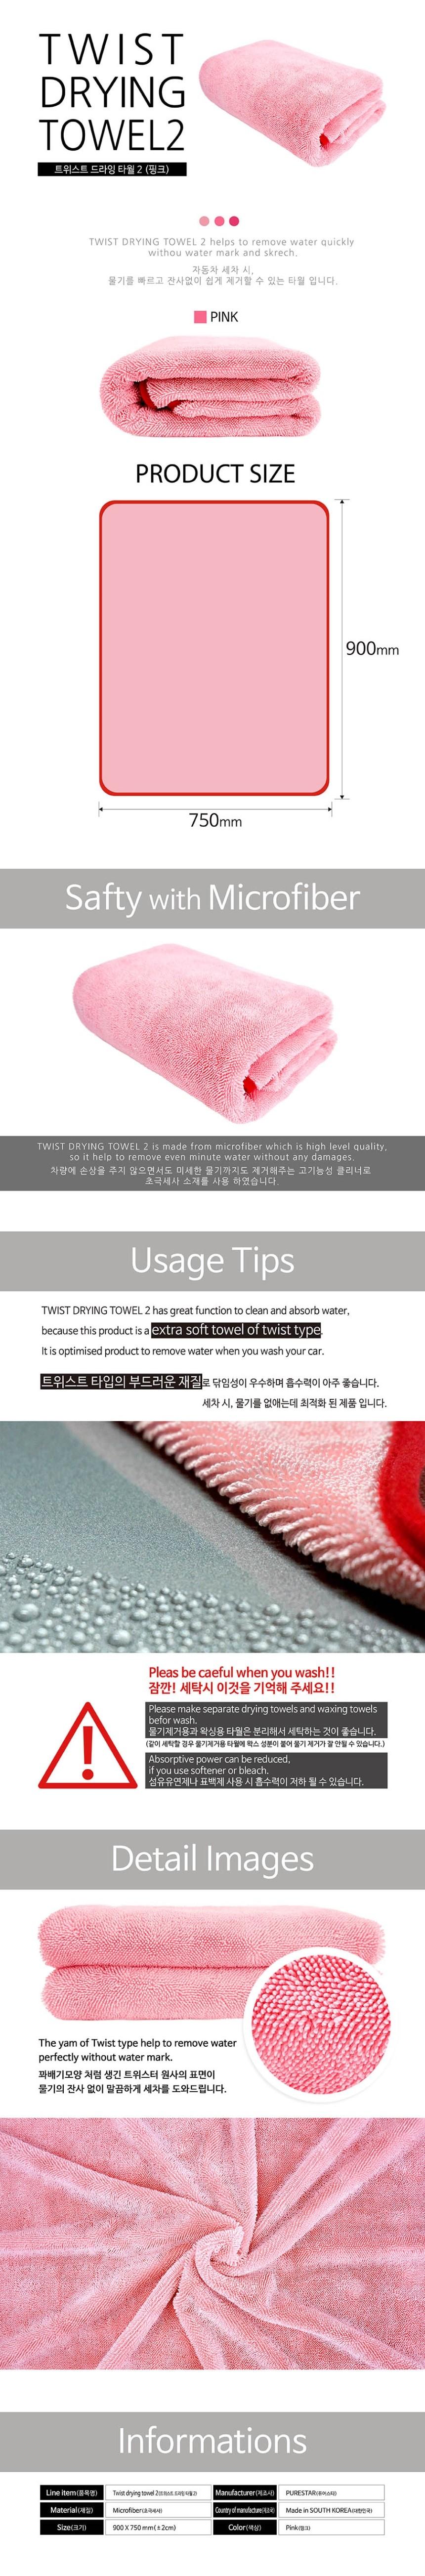 Purestar_drying_towel_twist_drying_towel_2_pink1.jpg